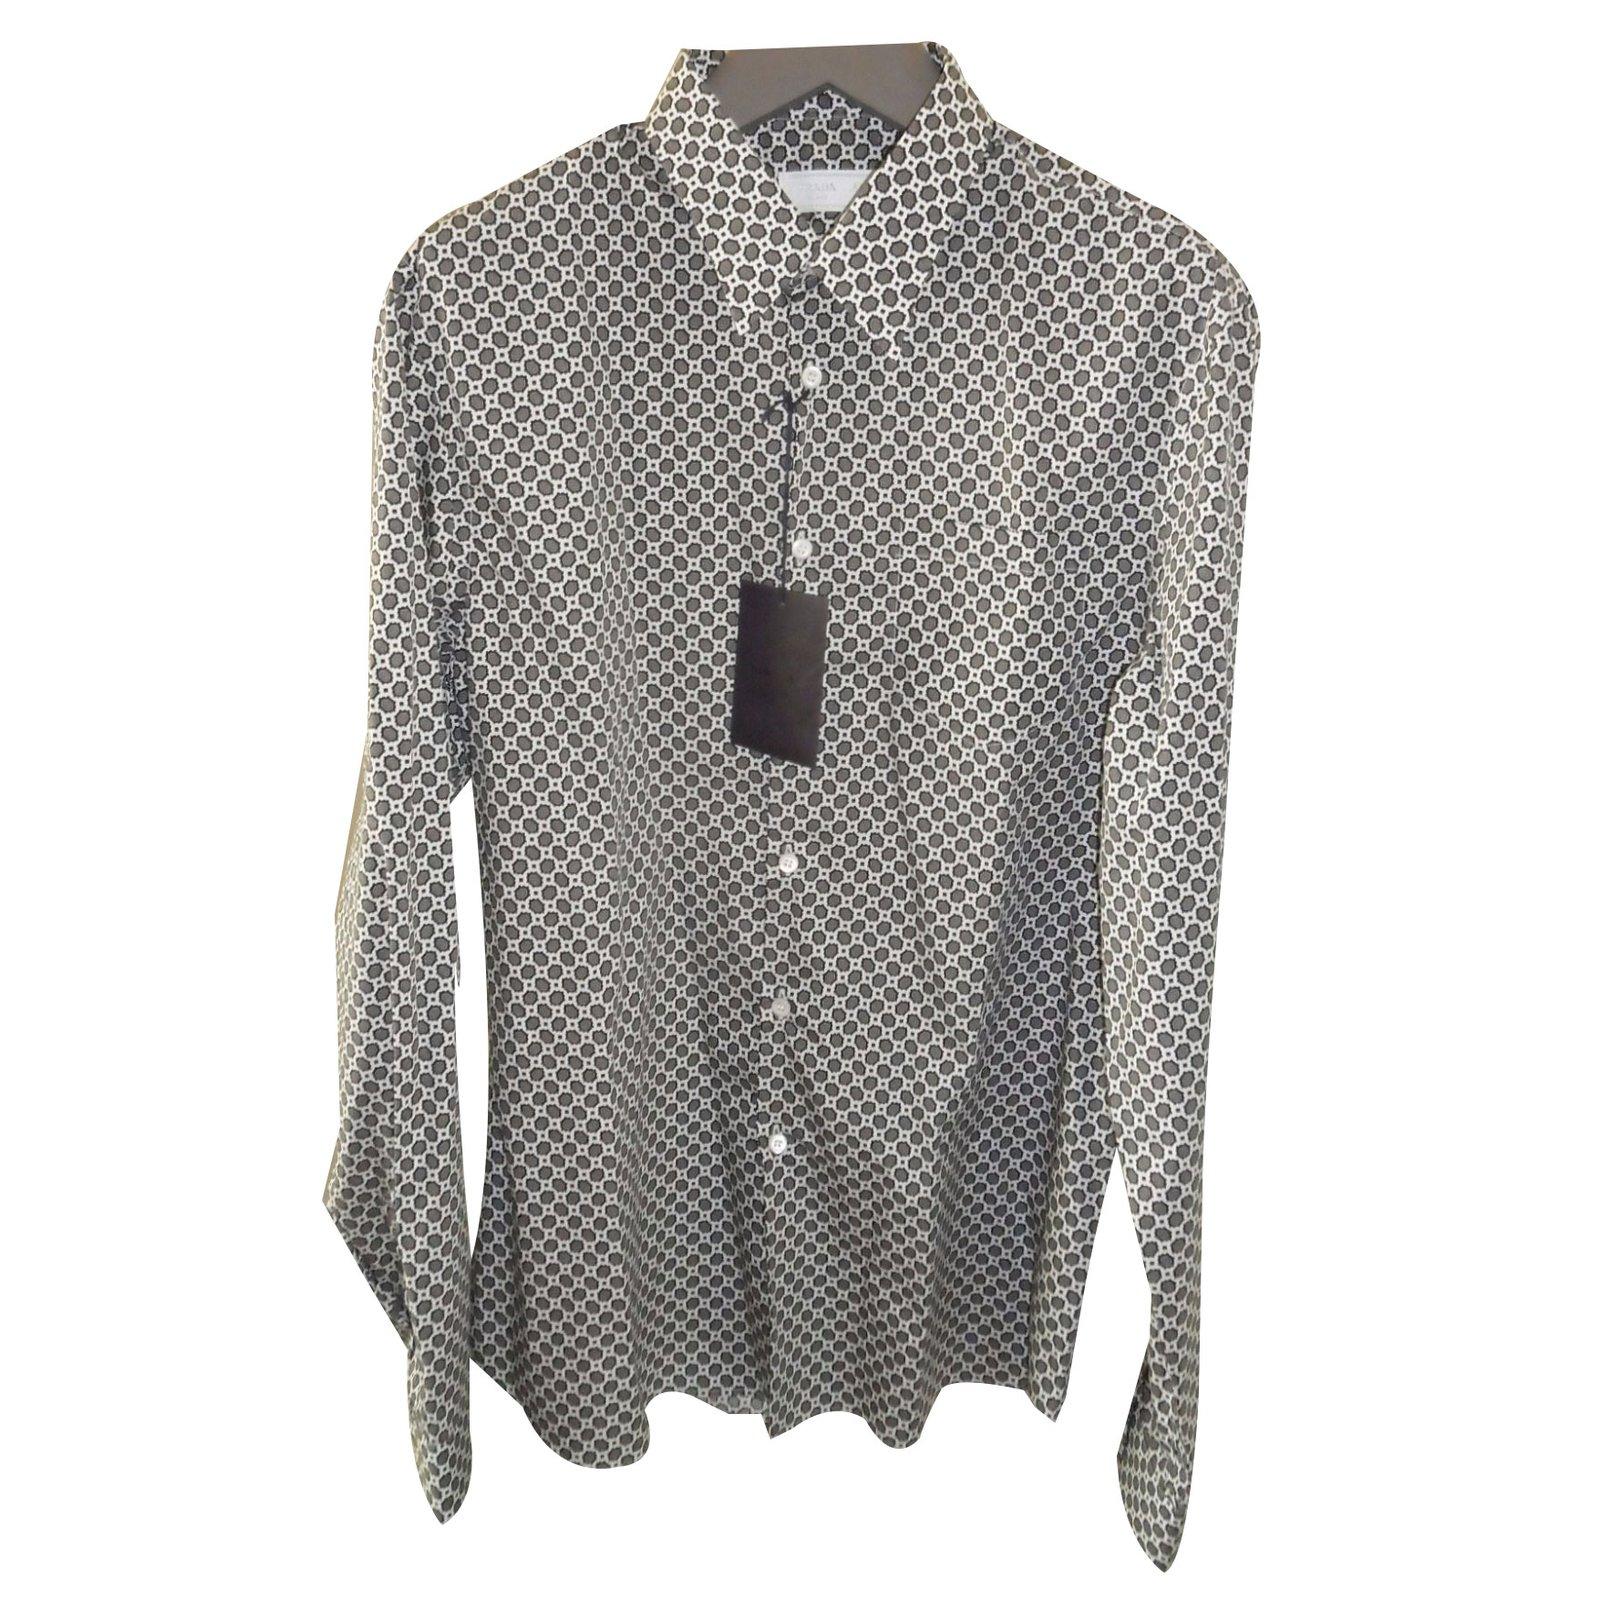 Prada Men S Dress Shirt Shirts Cotton Multiple Colors Ref 23171